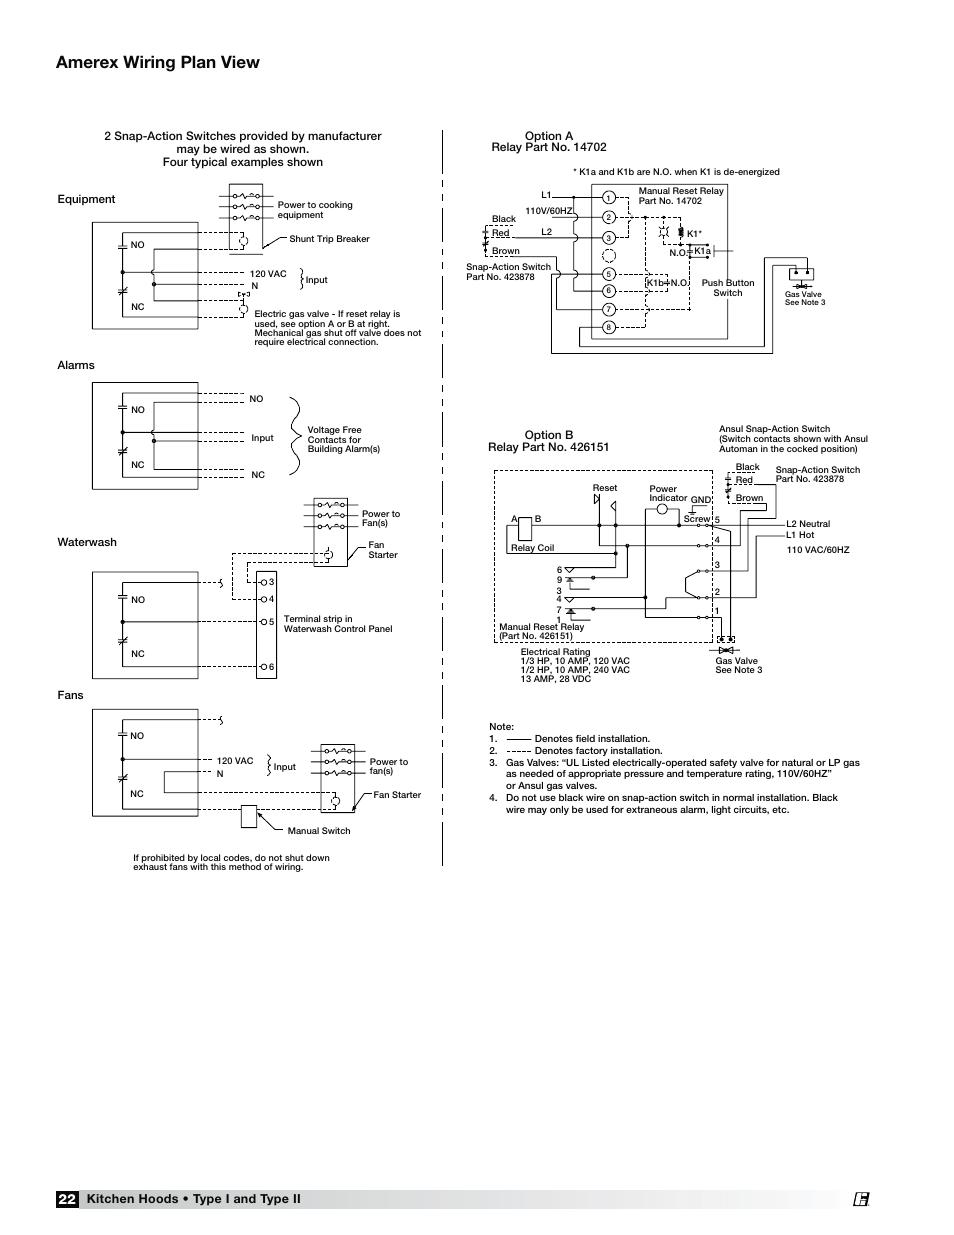 amerex wiring diagram wiring library amerex wiring diagram